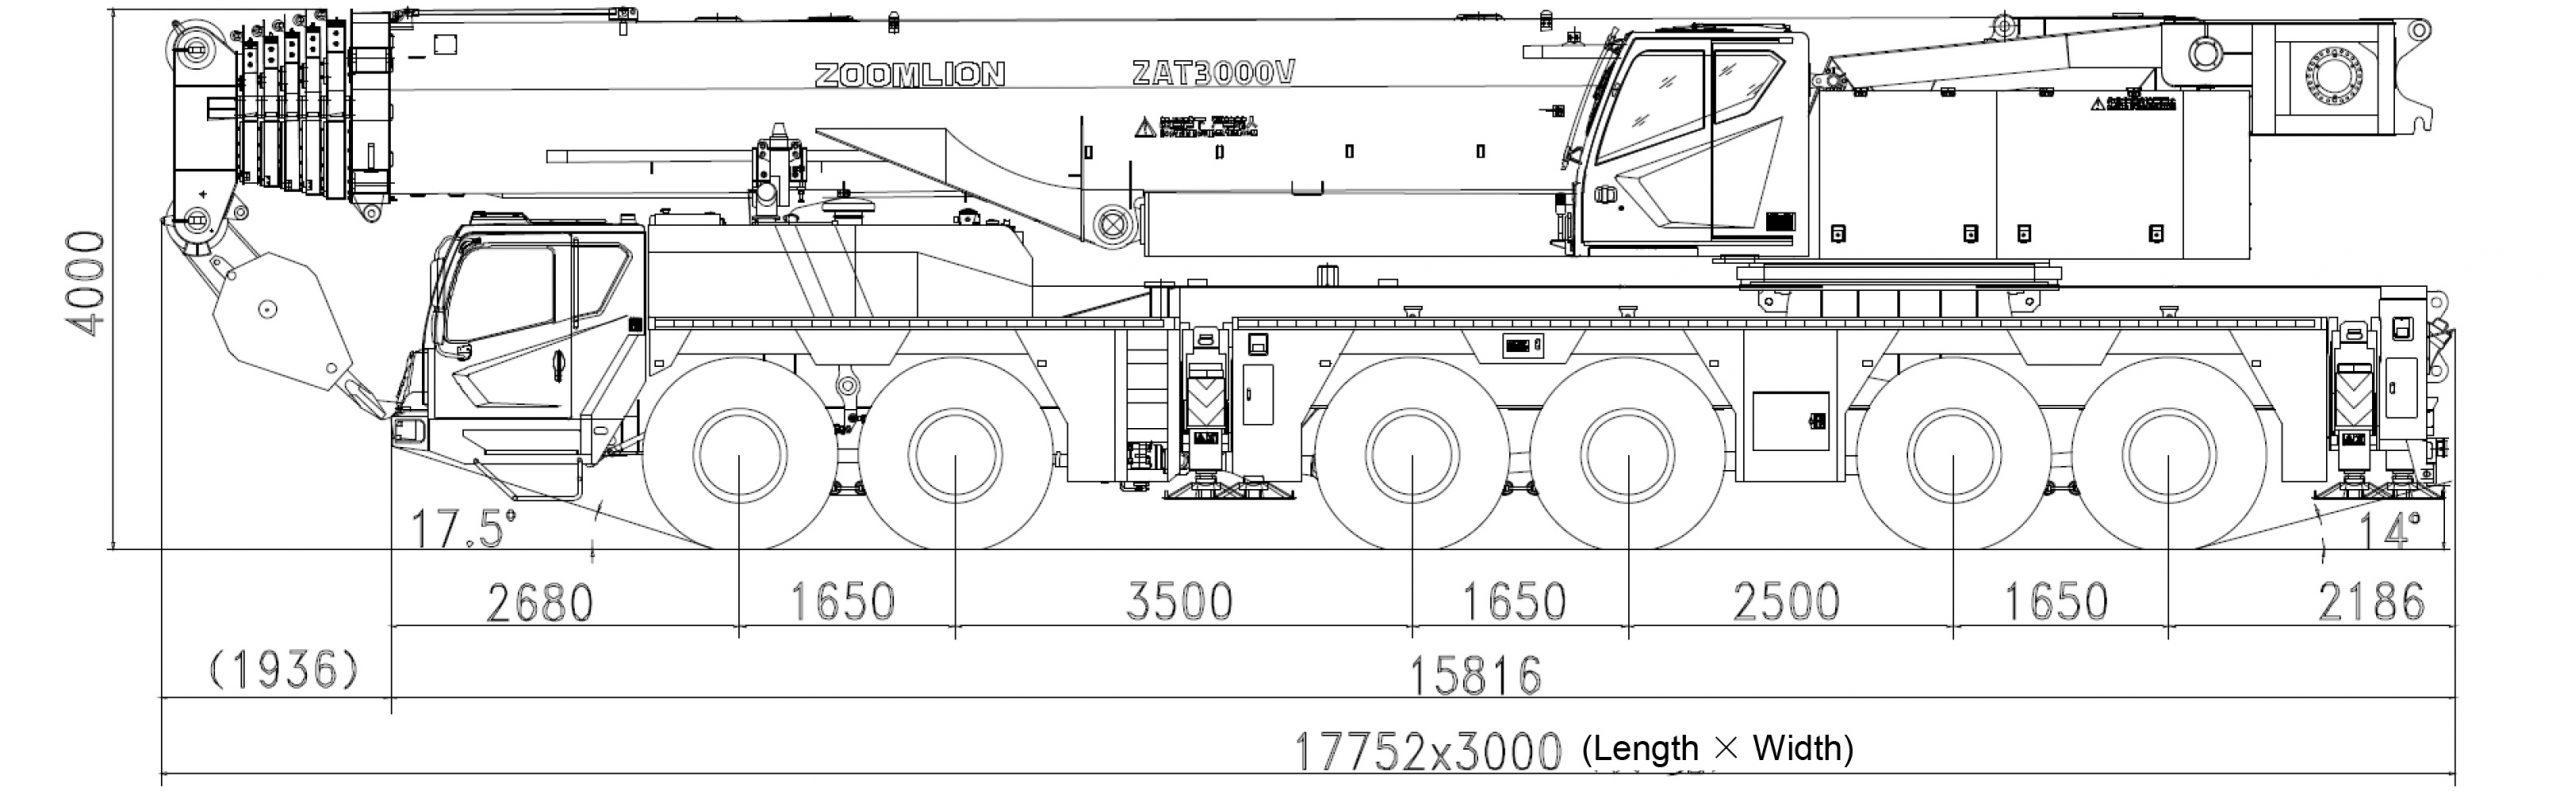 Размеры полноприводного крана ZAT3000 Zoomlion